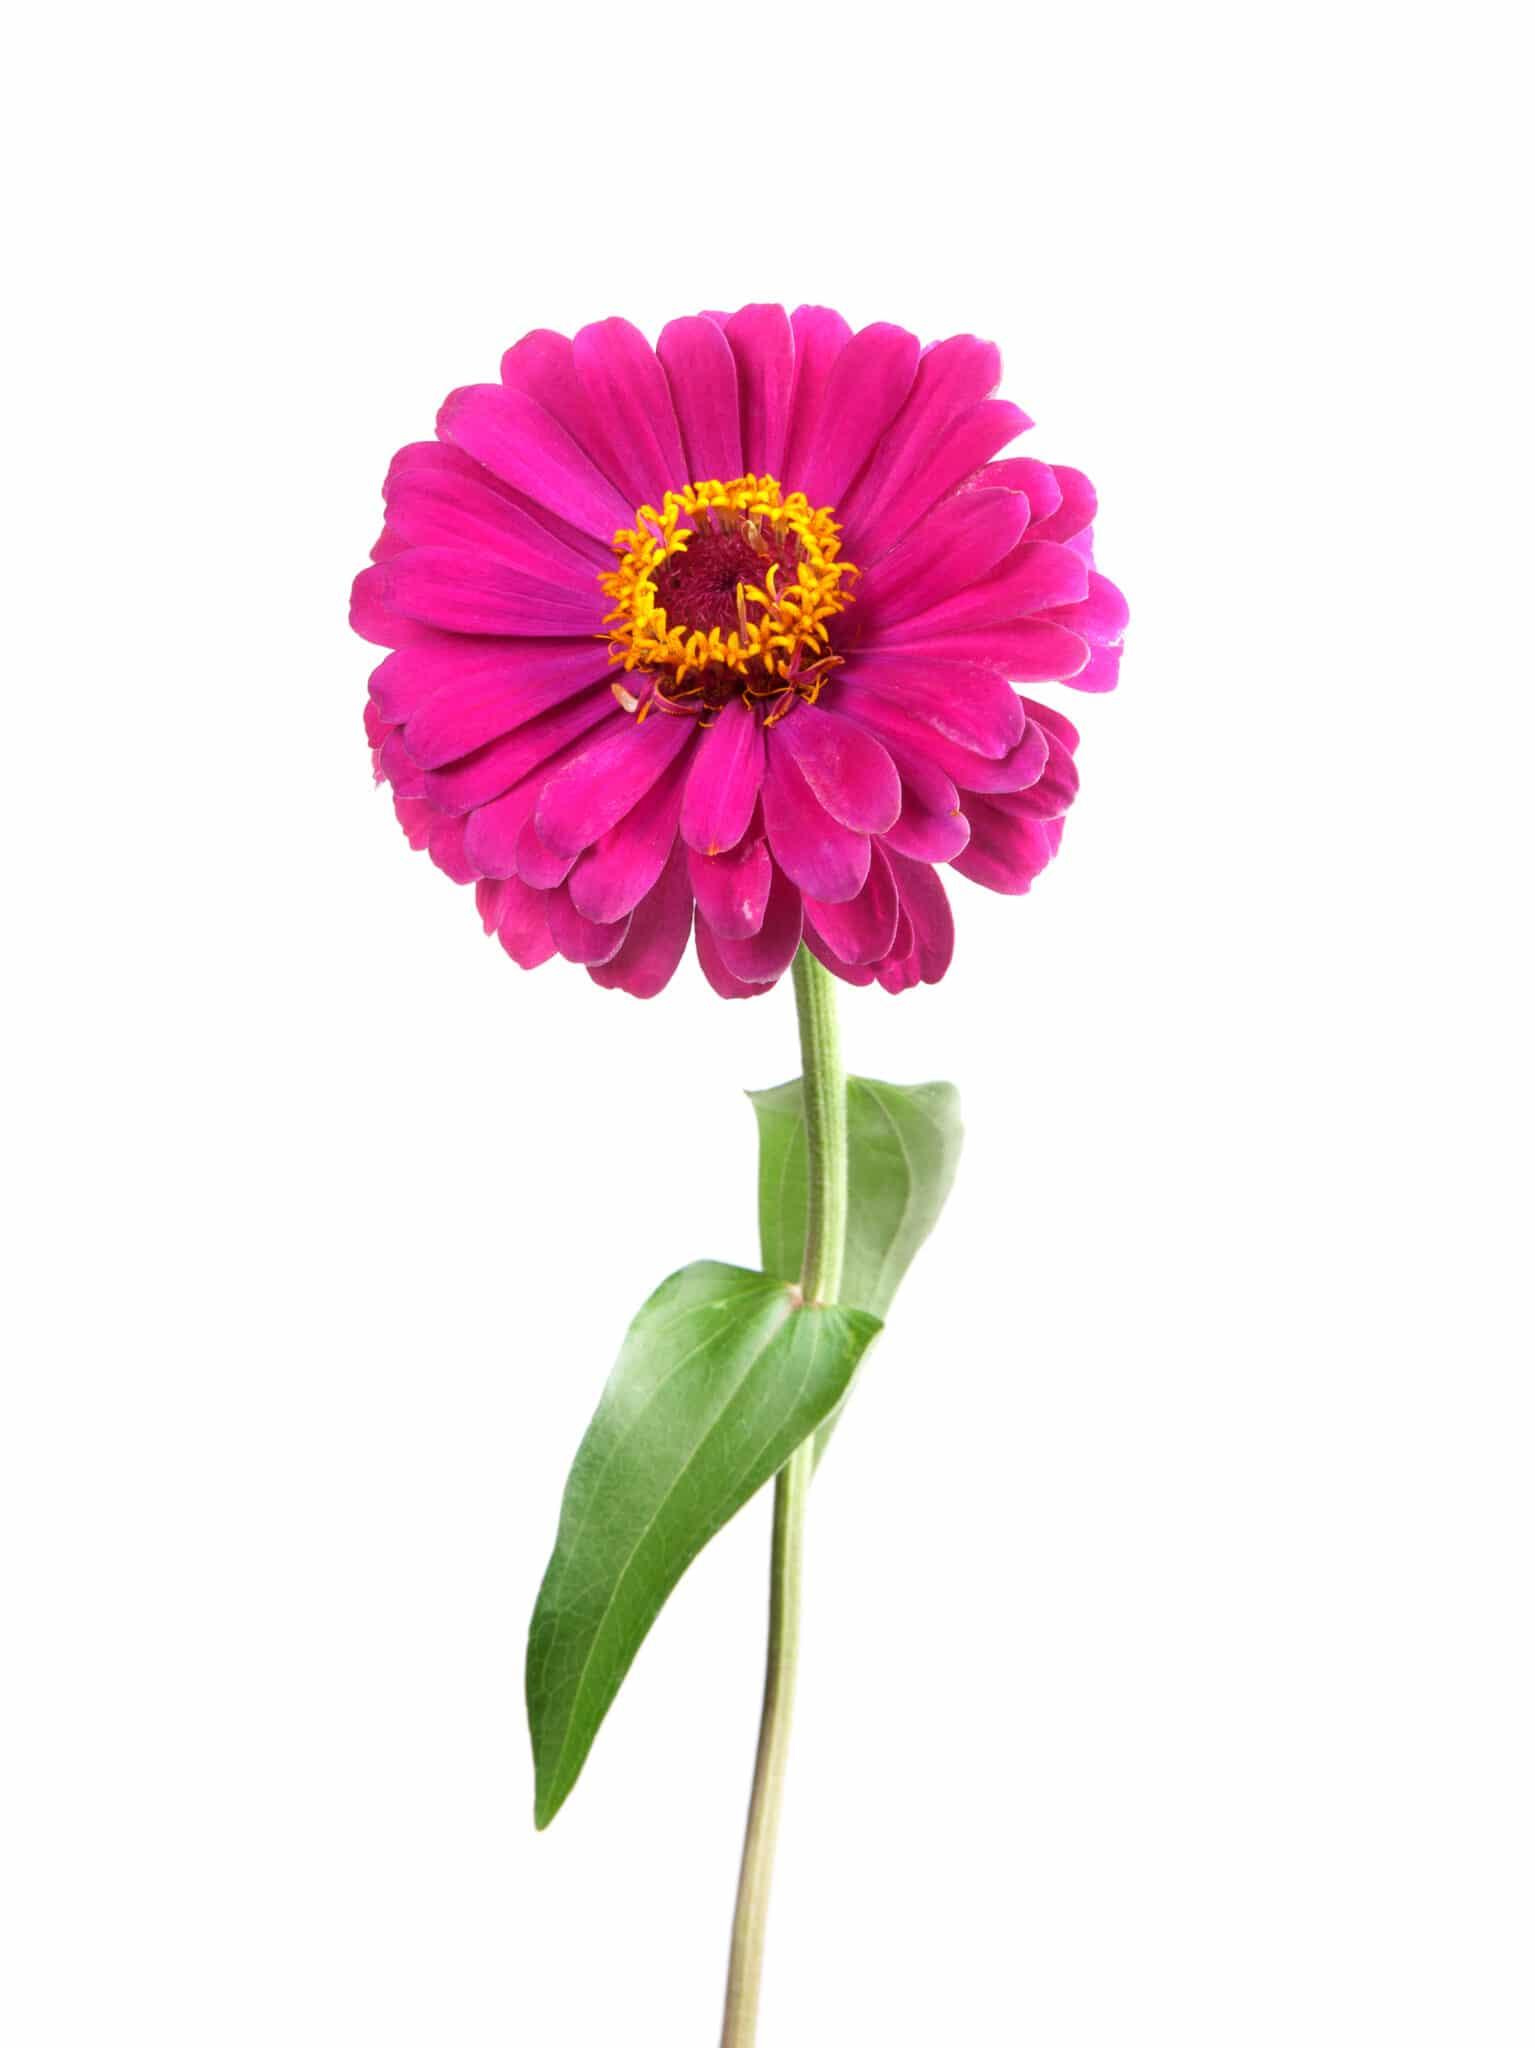 A pink zinnea flower on the stem.